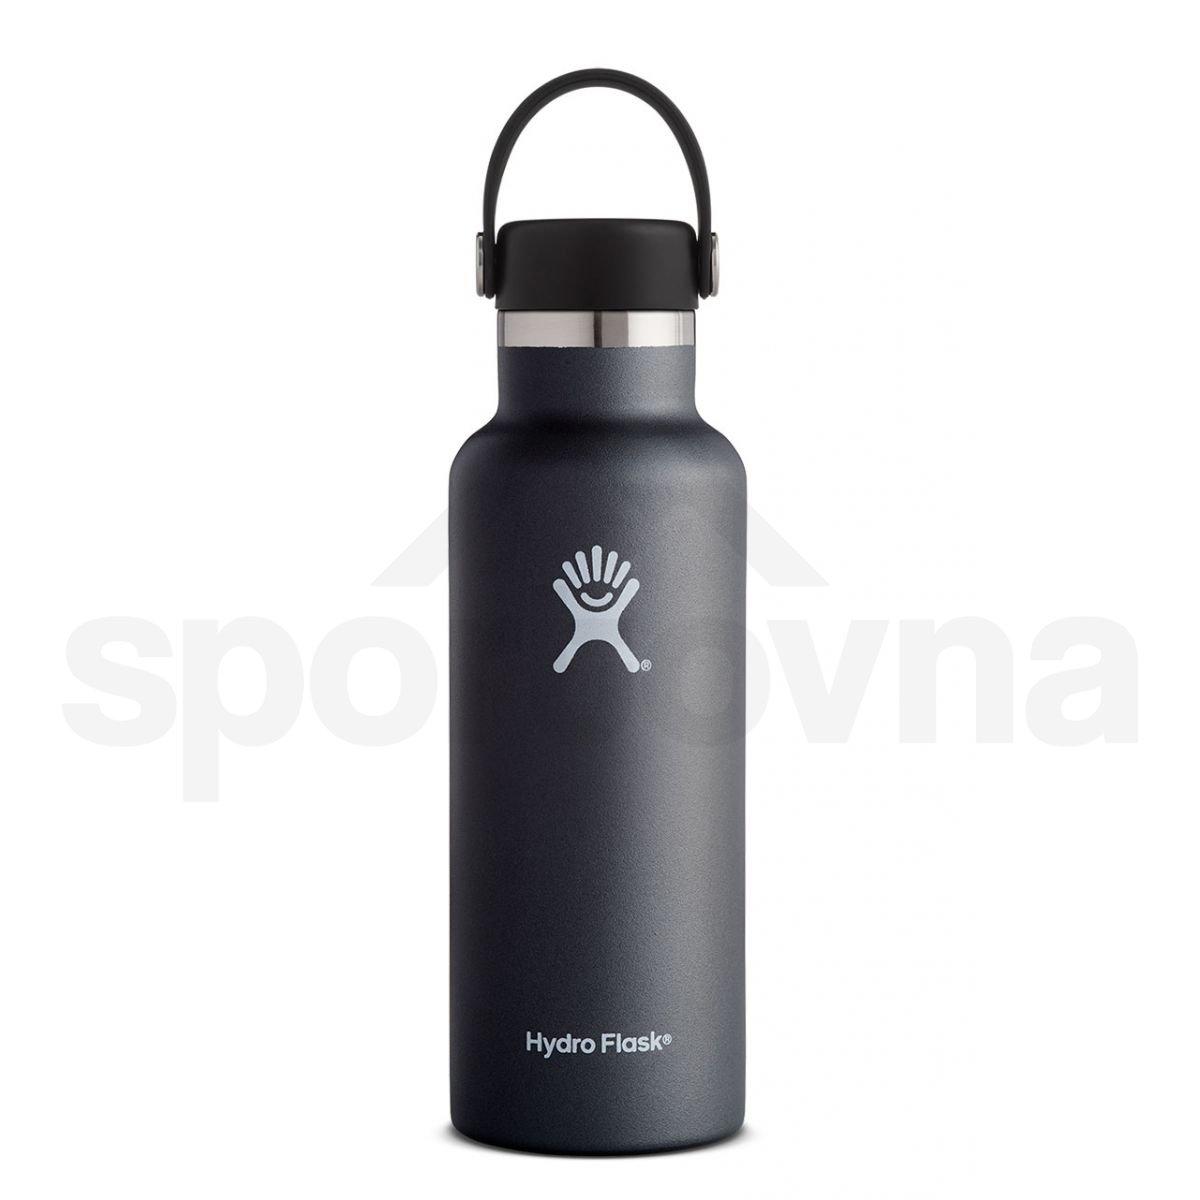 S18SX001 hydro flask 18 black